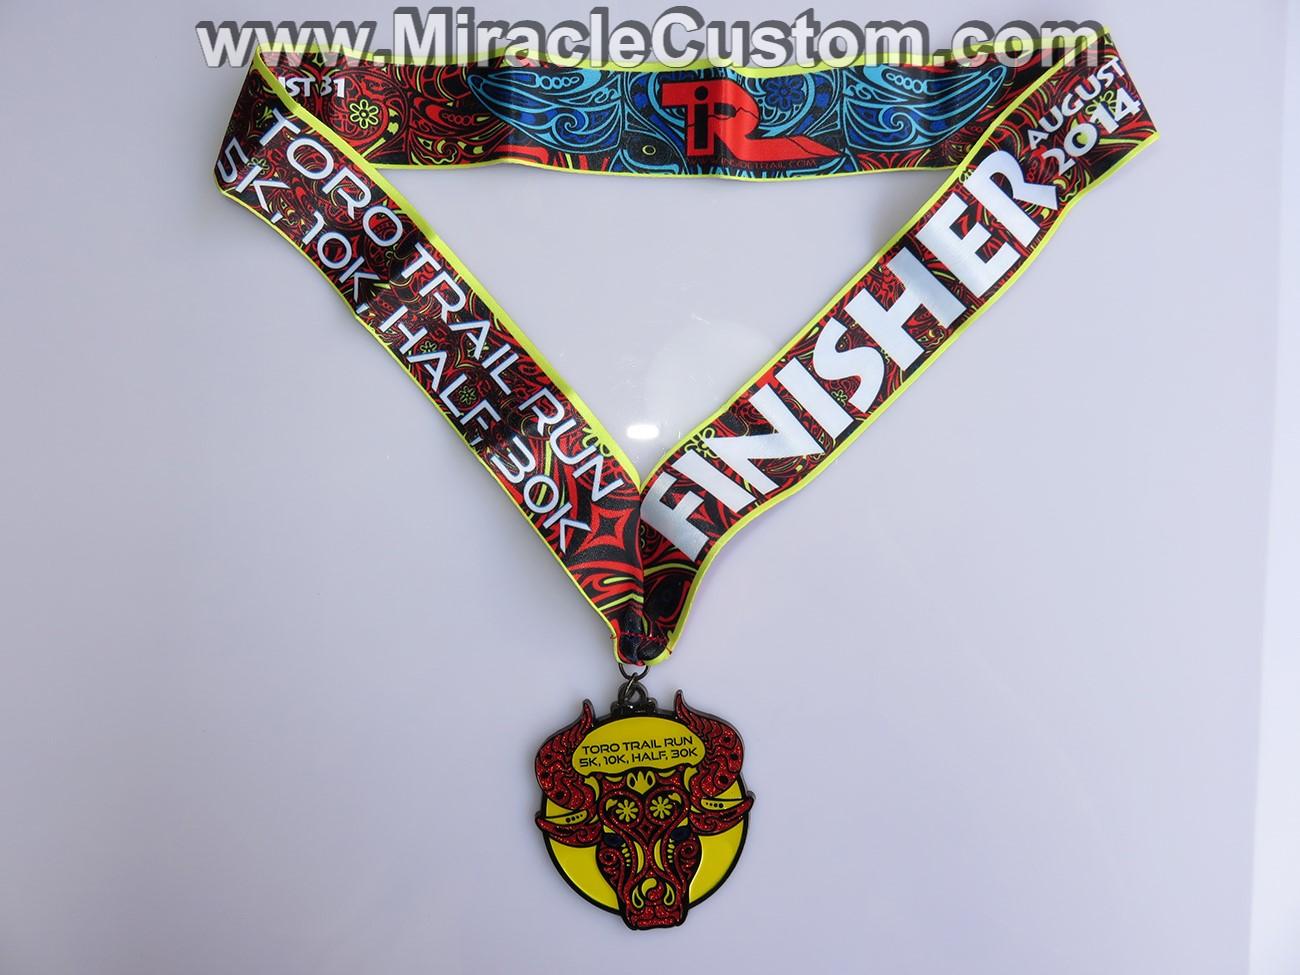 Custom Epoxy Marathon Medals